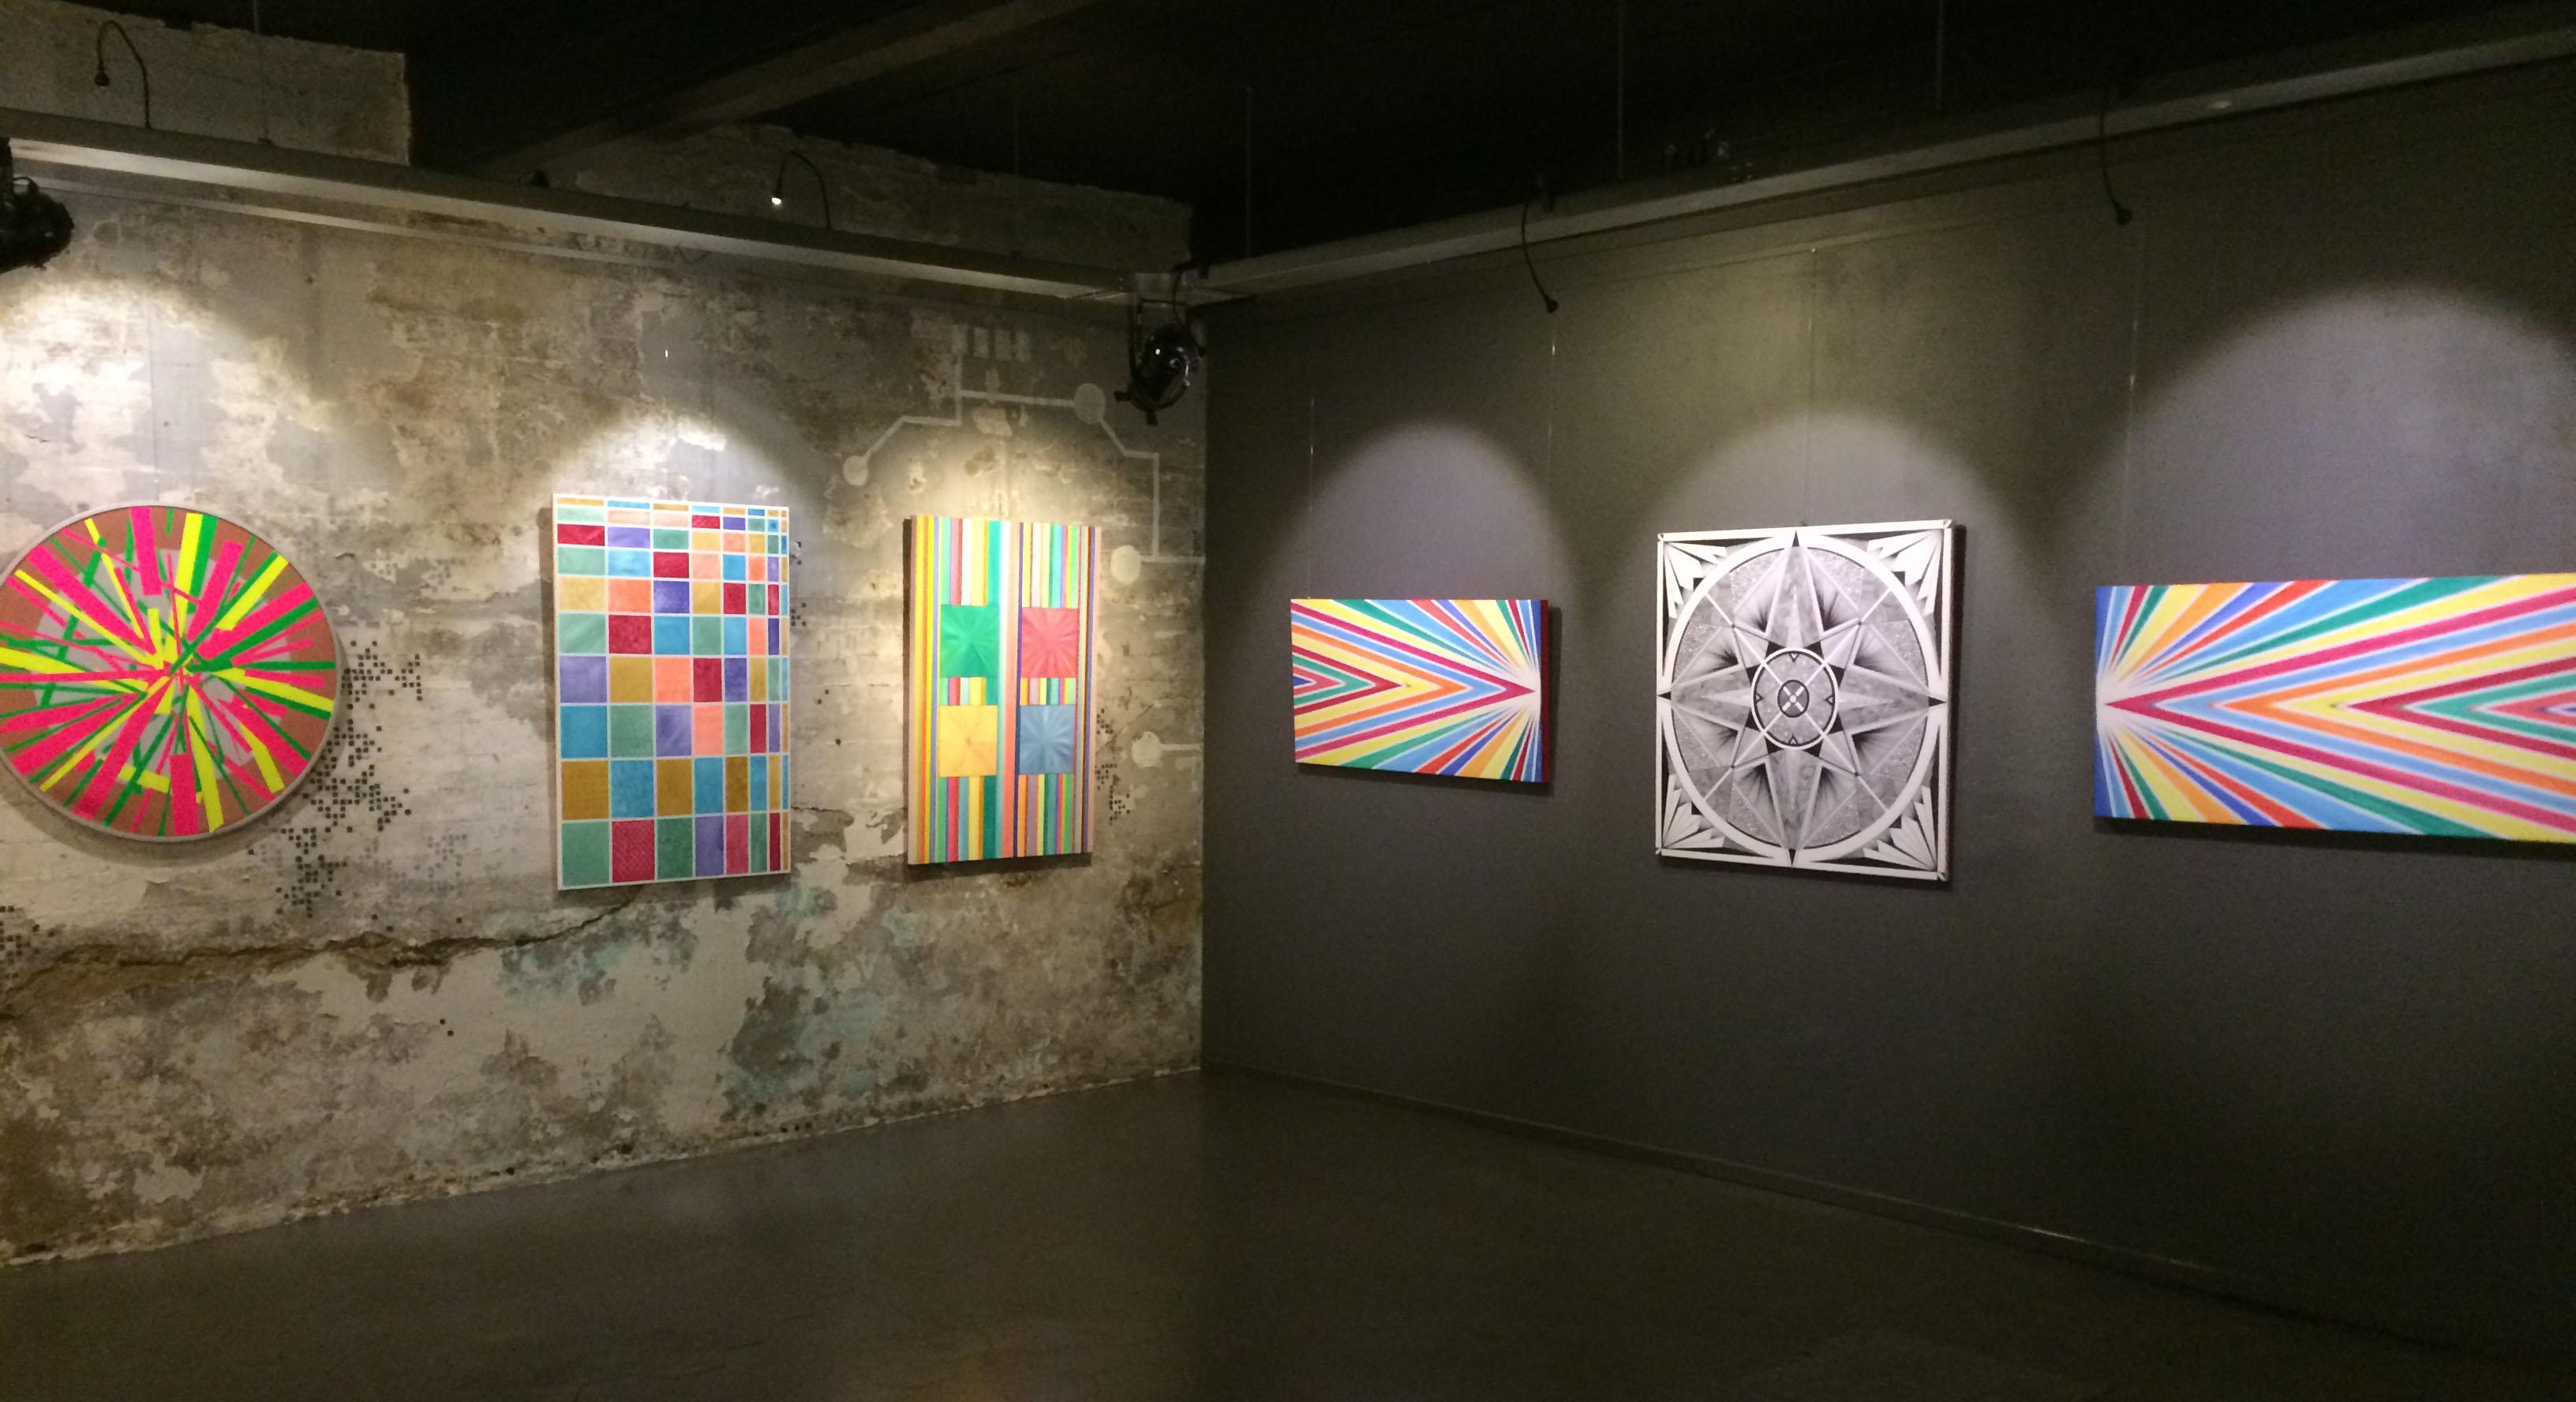 Salle d'exposition Art Gallery